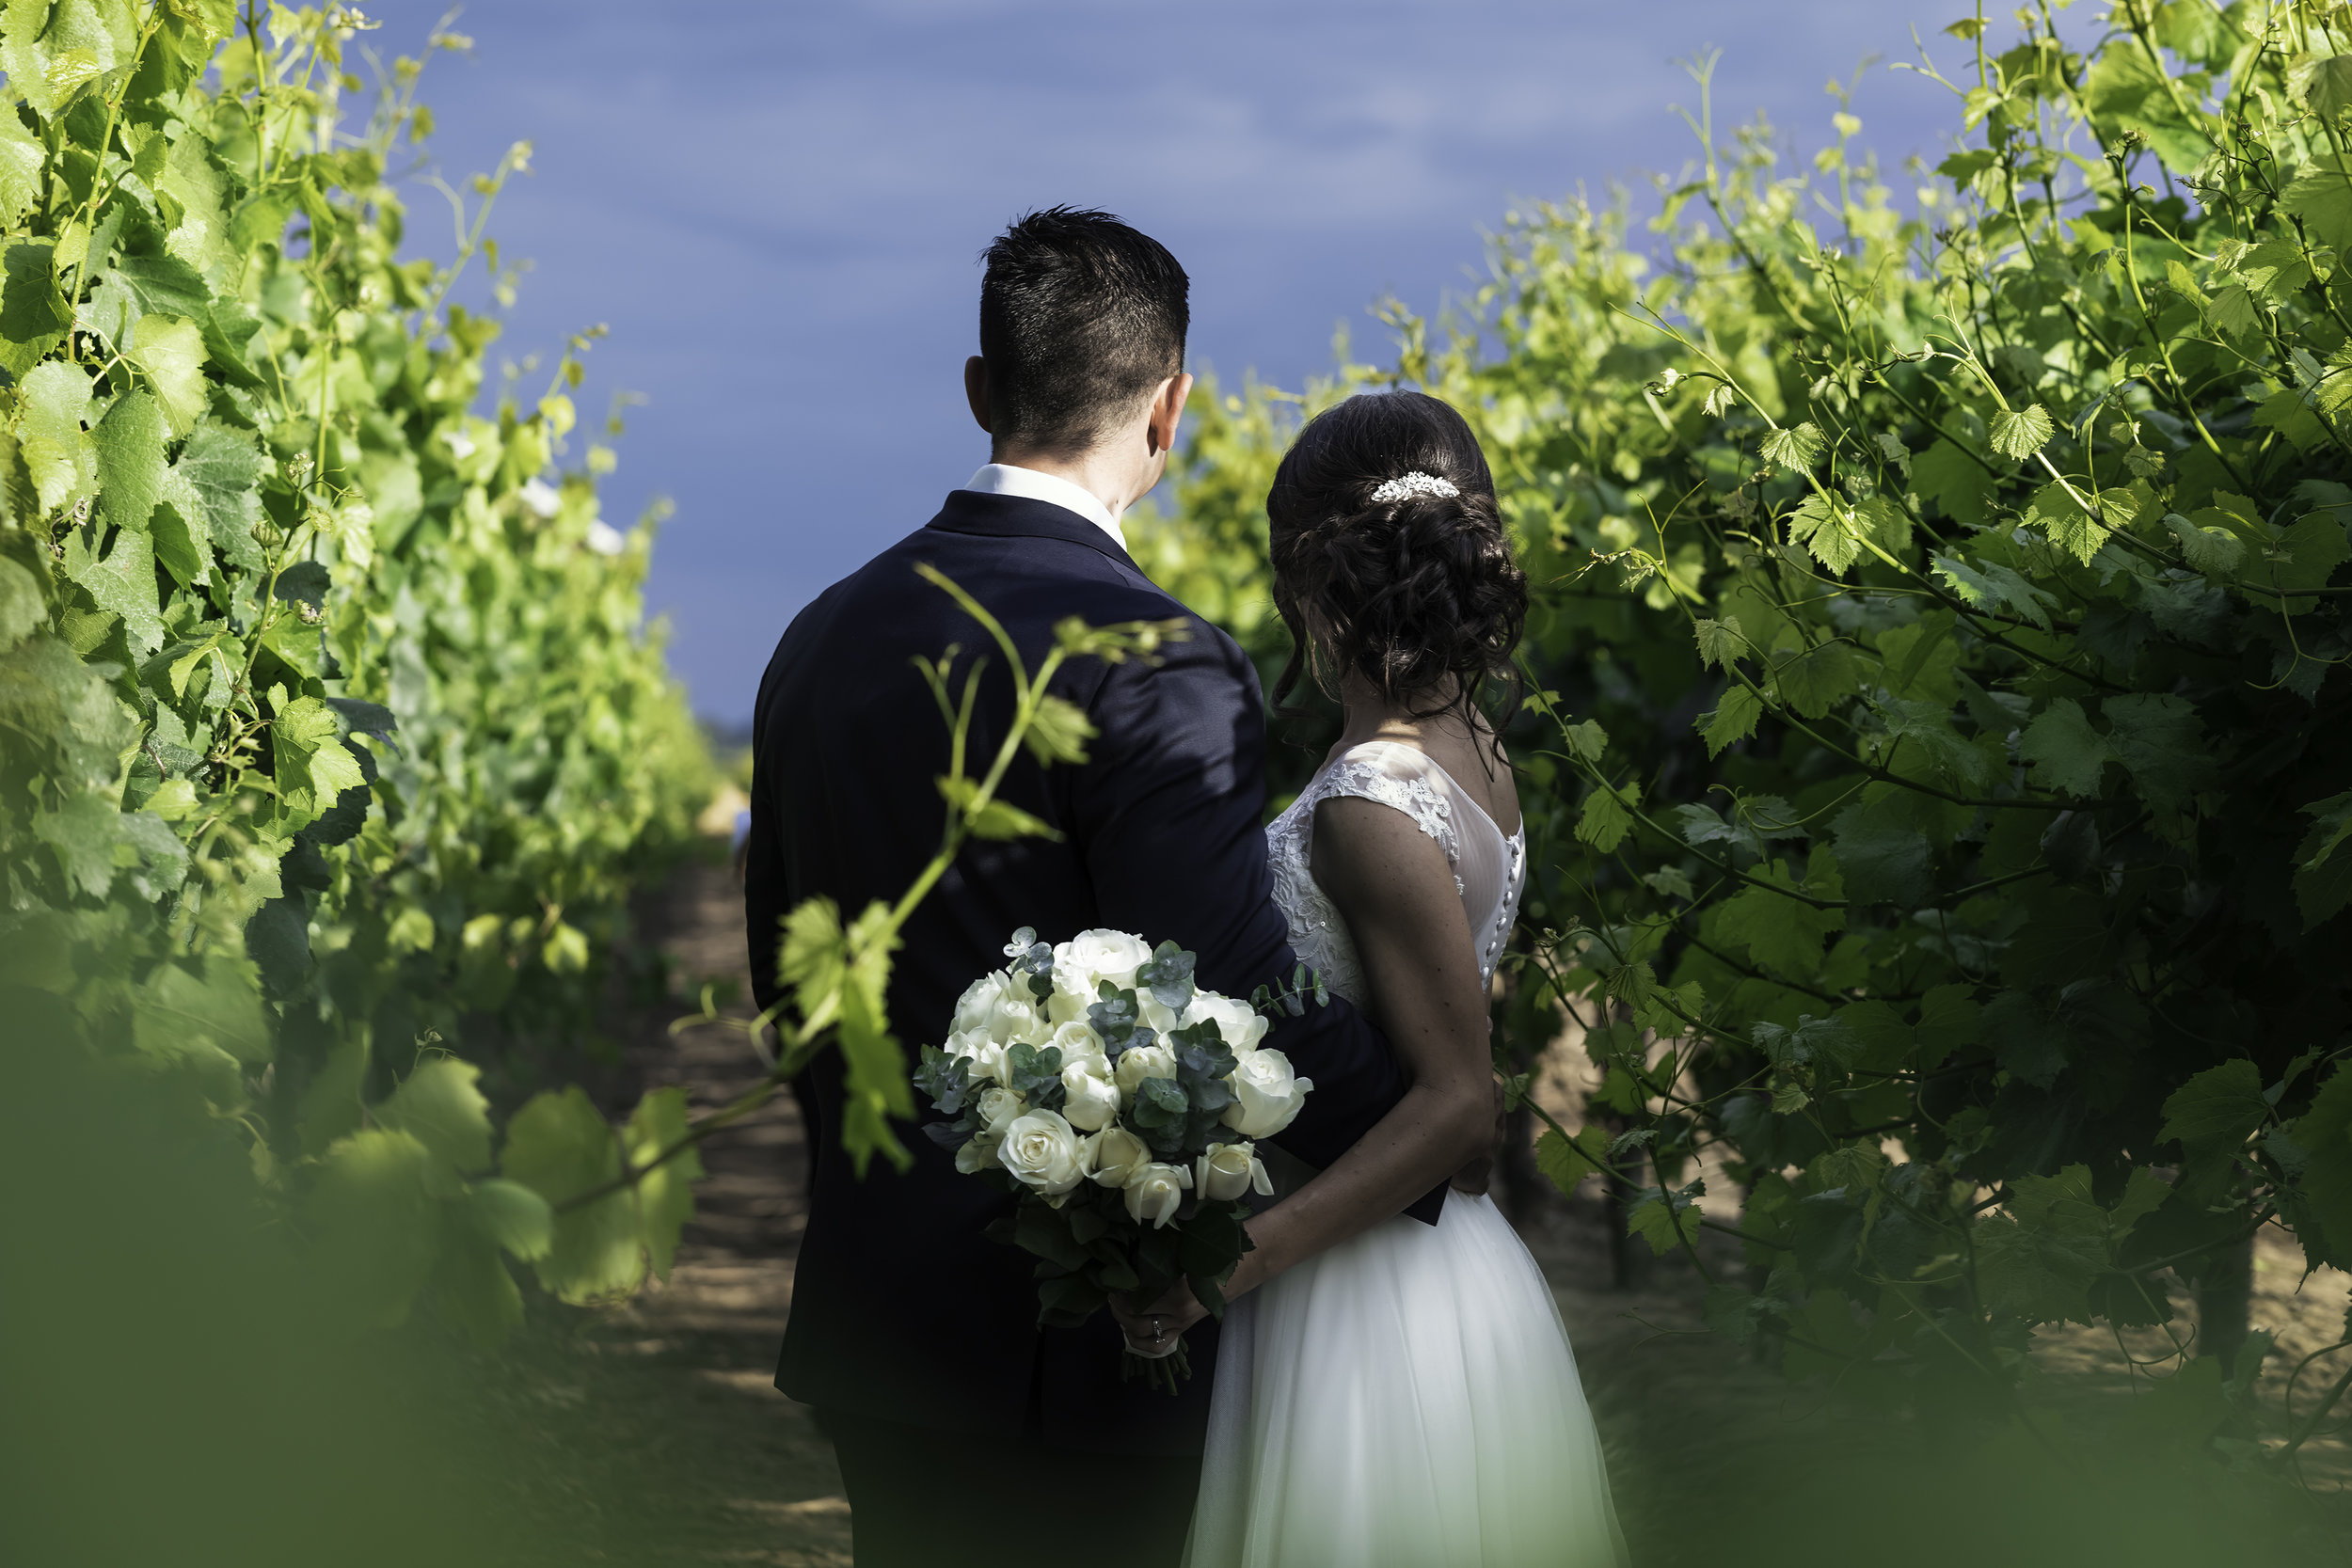 Nik & Jacquie Wedding - May 25th 2018